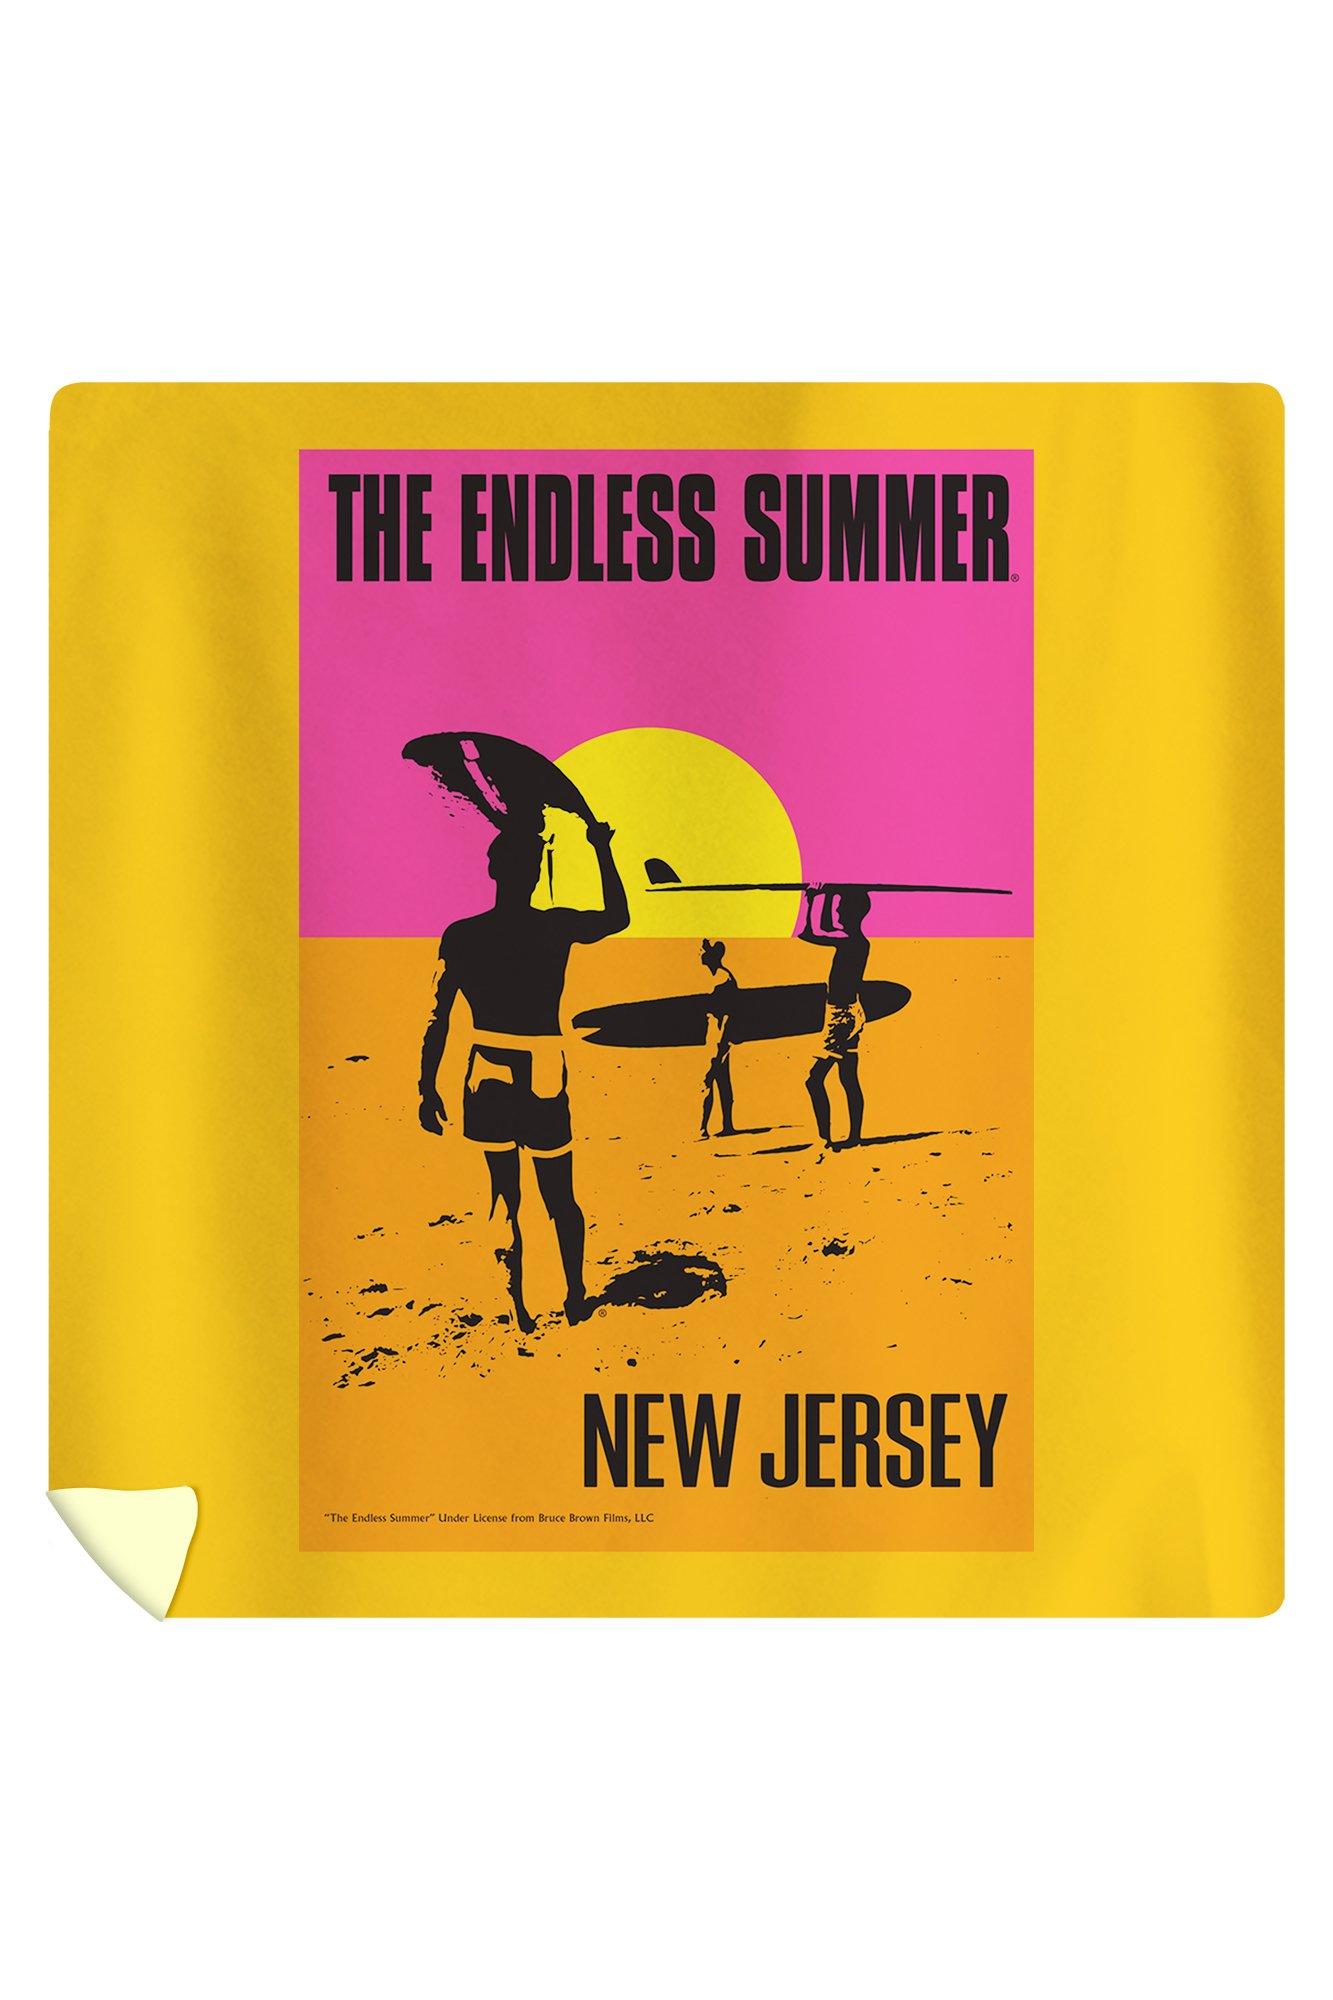 New Jersey - The Endless Summer - Original Movie Poster (88x88 Queen Microfiber Duvet Cover)